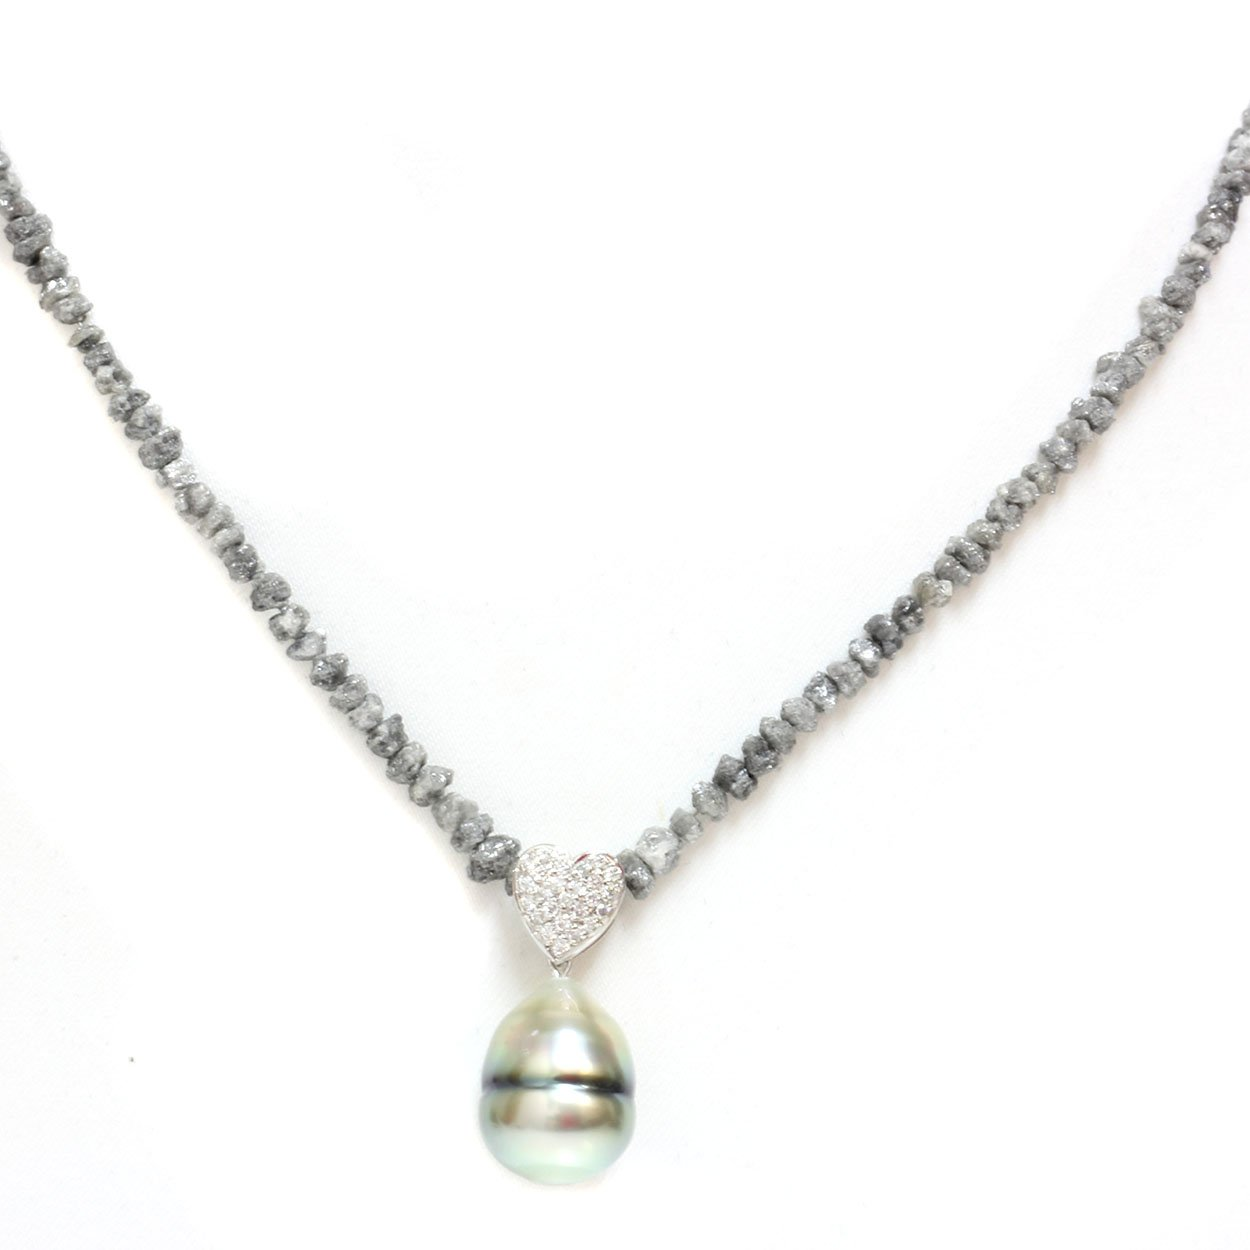 1f06dfd78d45c Amazon.com: 18k Gold - Diamond Heart Tahitian South Sea Cultured ...